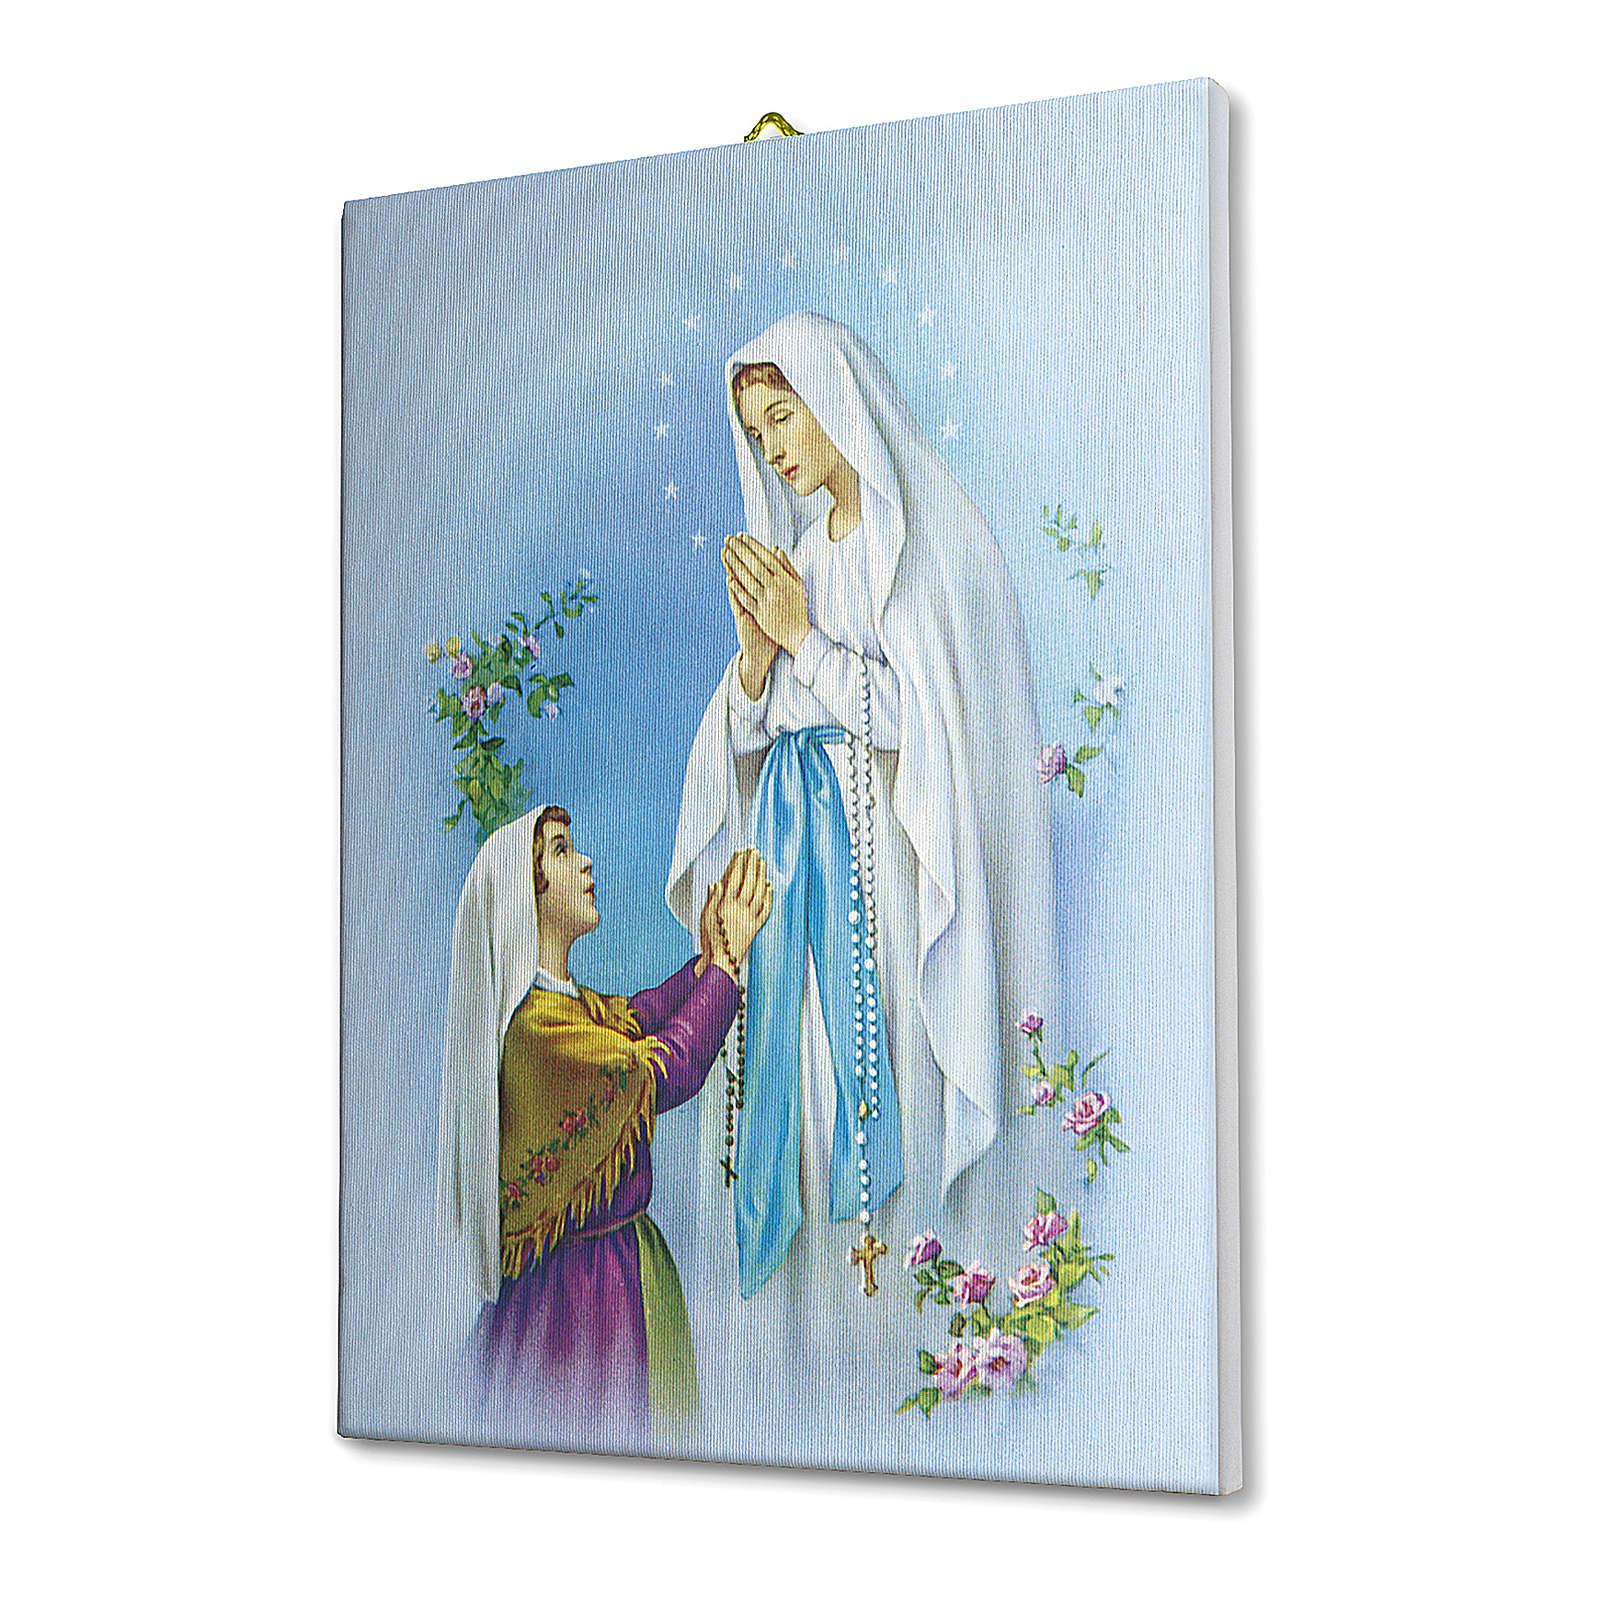 Cuadro sobre tela pictórica Aparición de Lourdes con Bernadette 70x50 cm 3